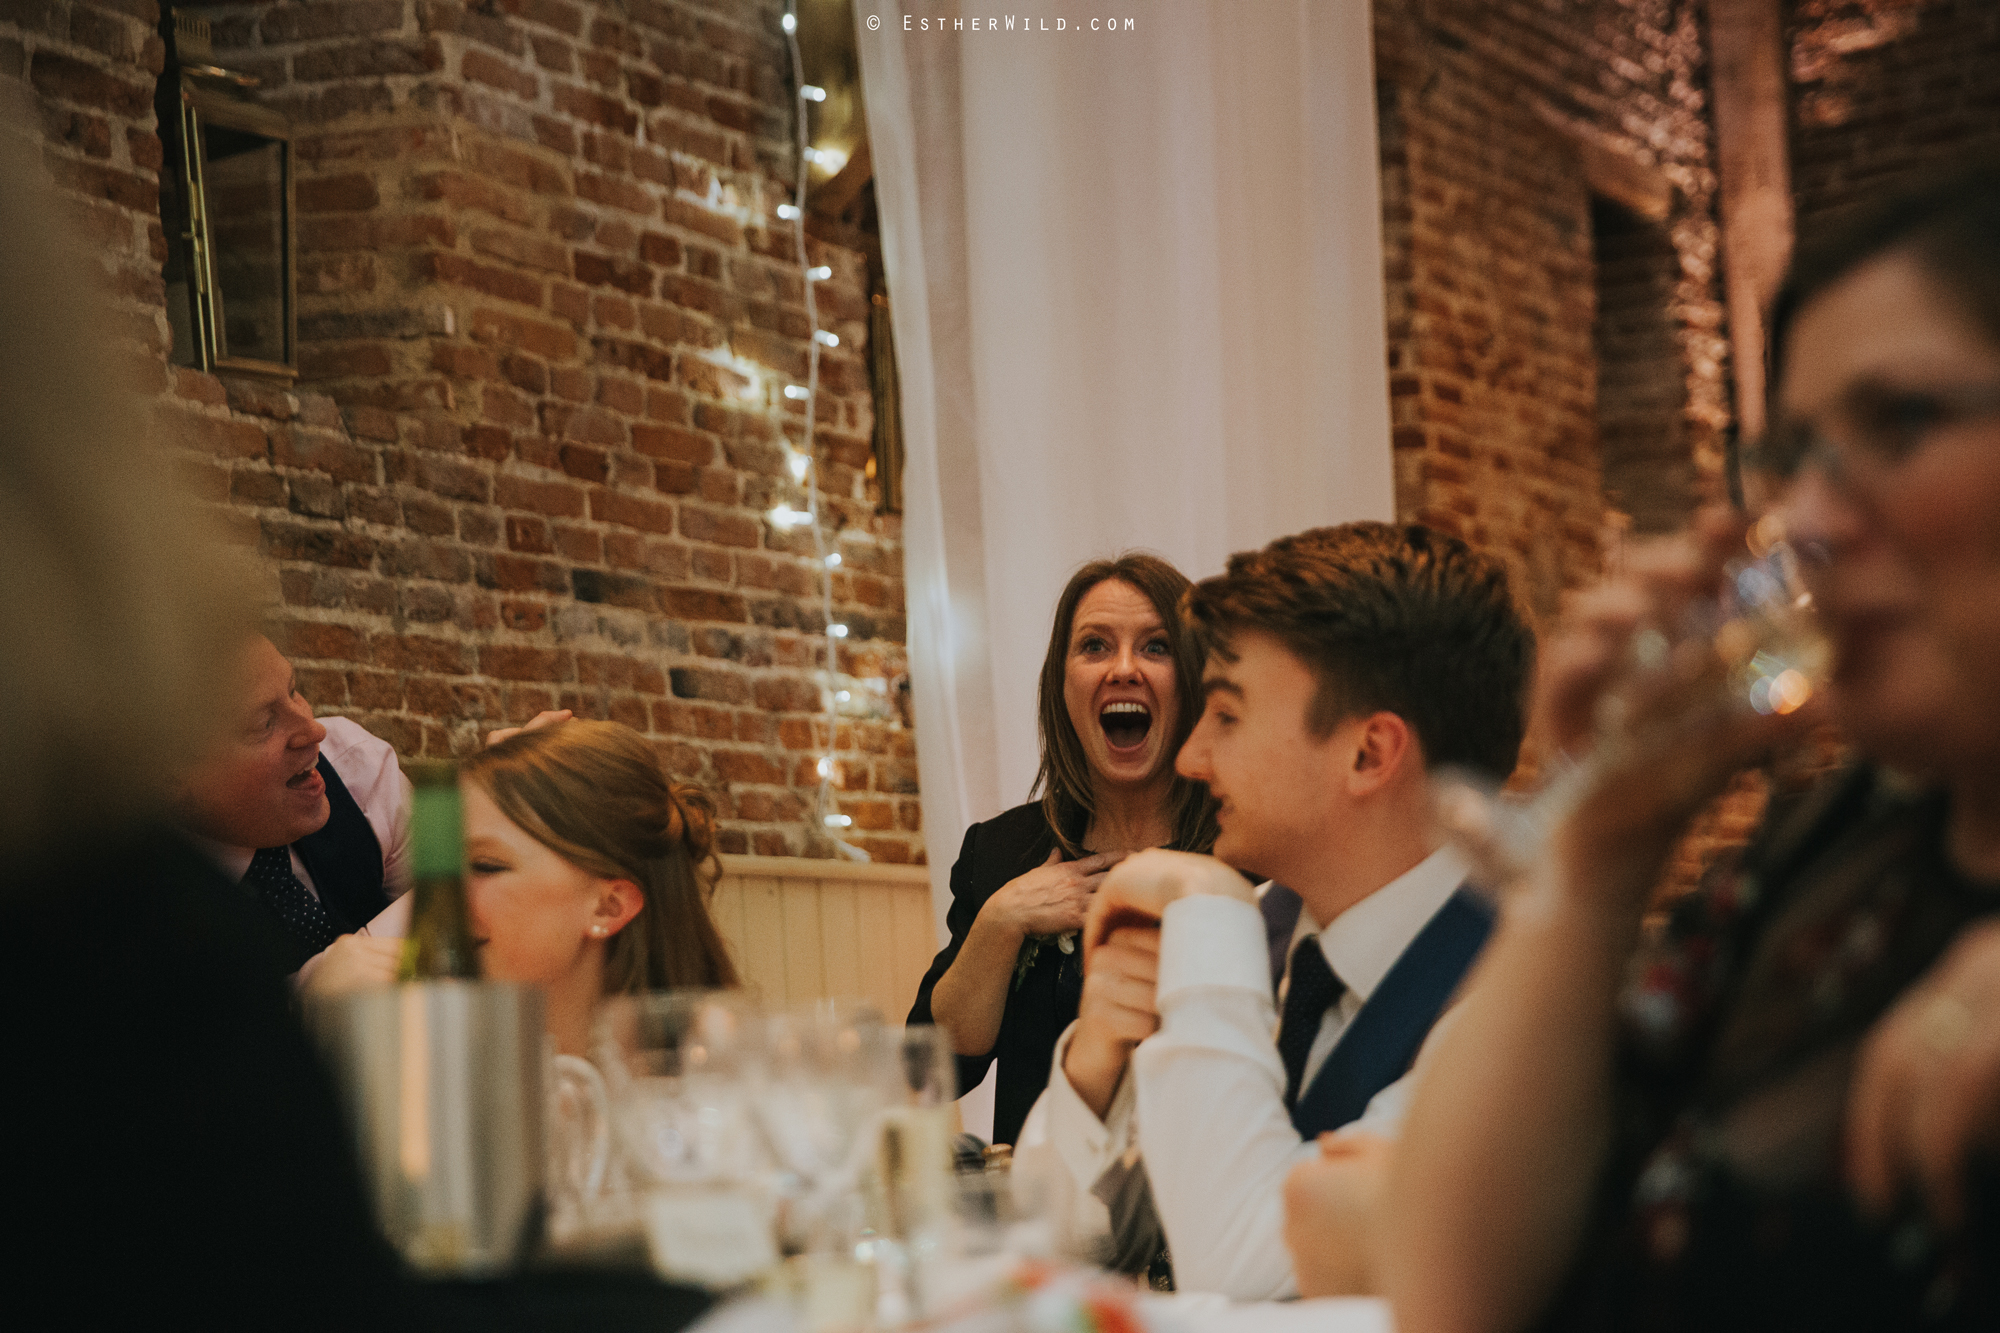 Elms_Barn_Weddings_Suffolk_Photographer_Copyright_Esther_Wild_IMG_2830.jpg